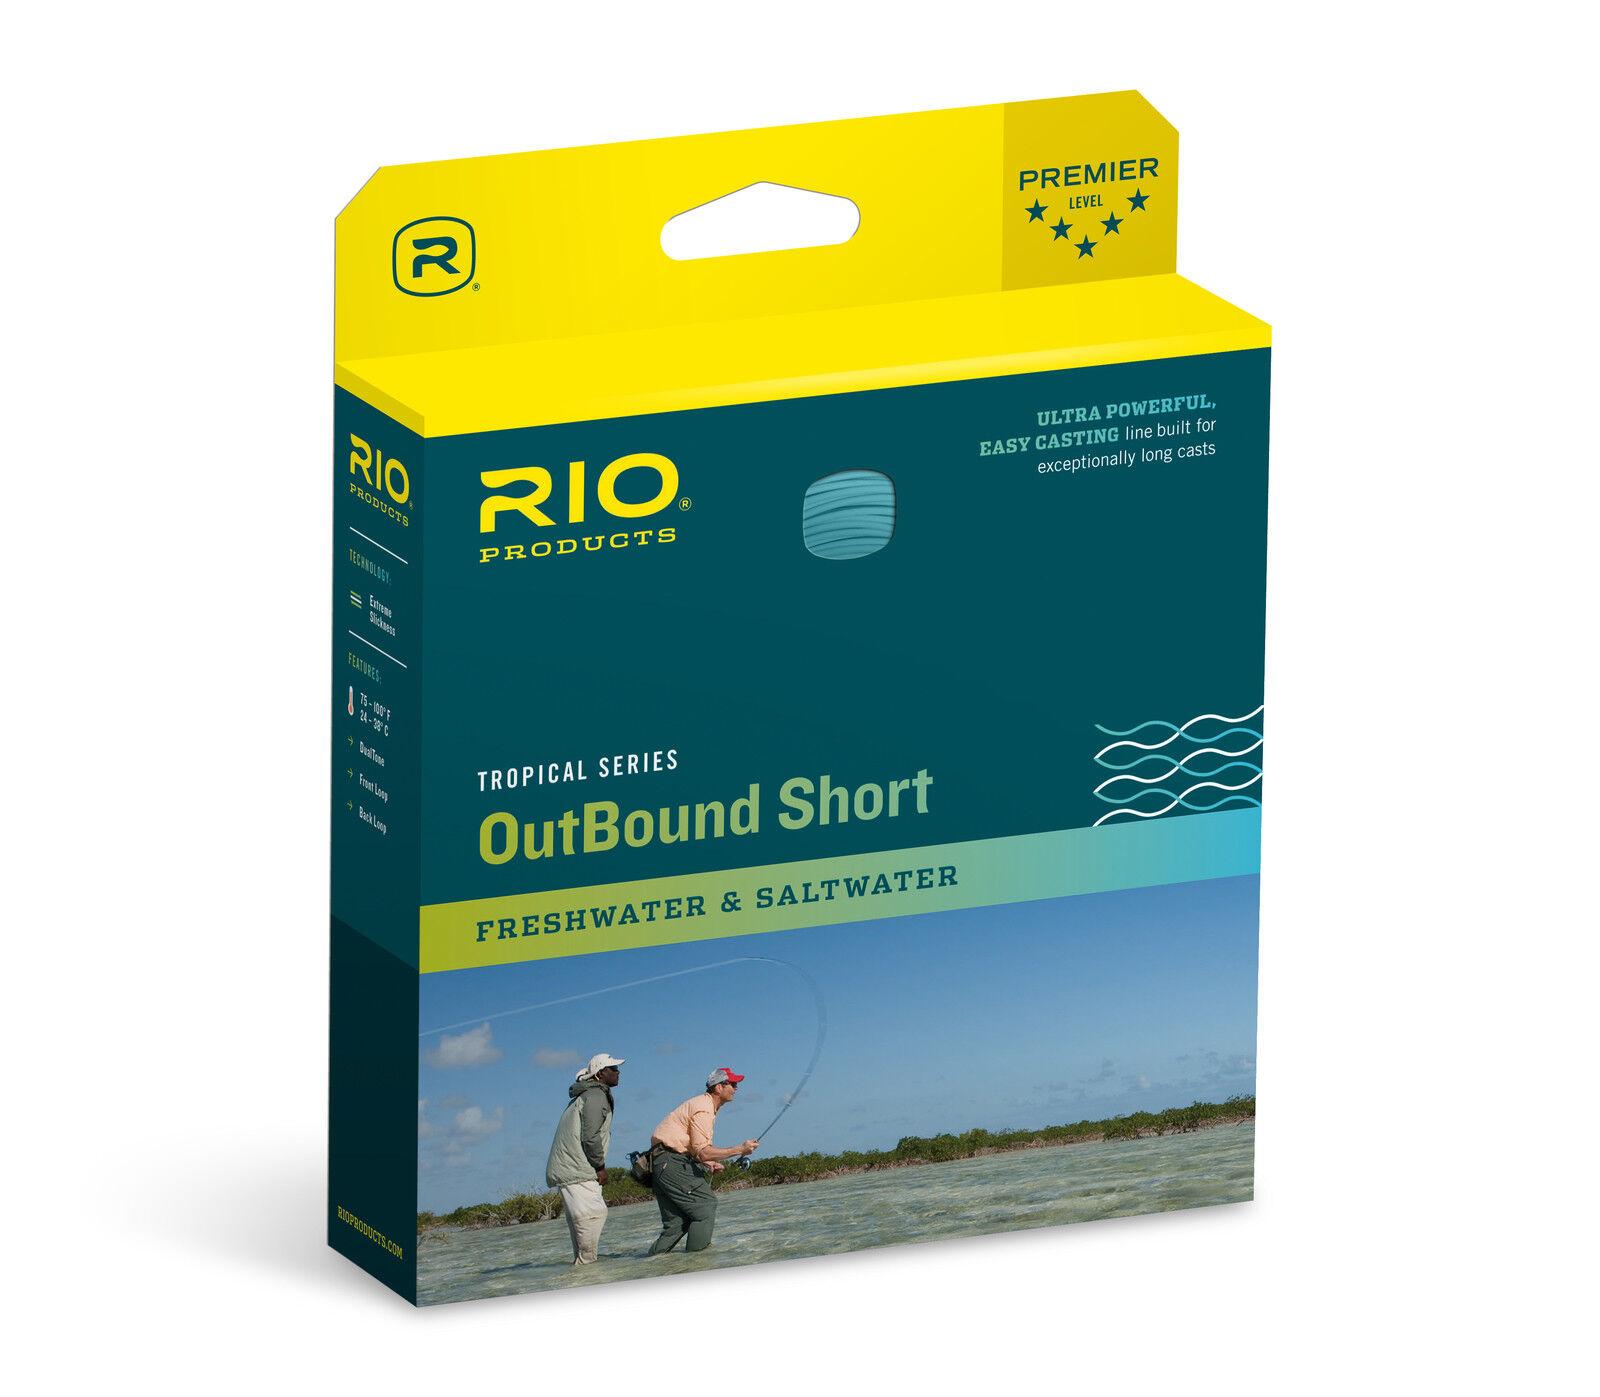 RIO Tropical Outbound Short Fly Line, WF10FI...30' Intermediate Head, nuovo